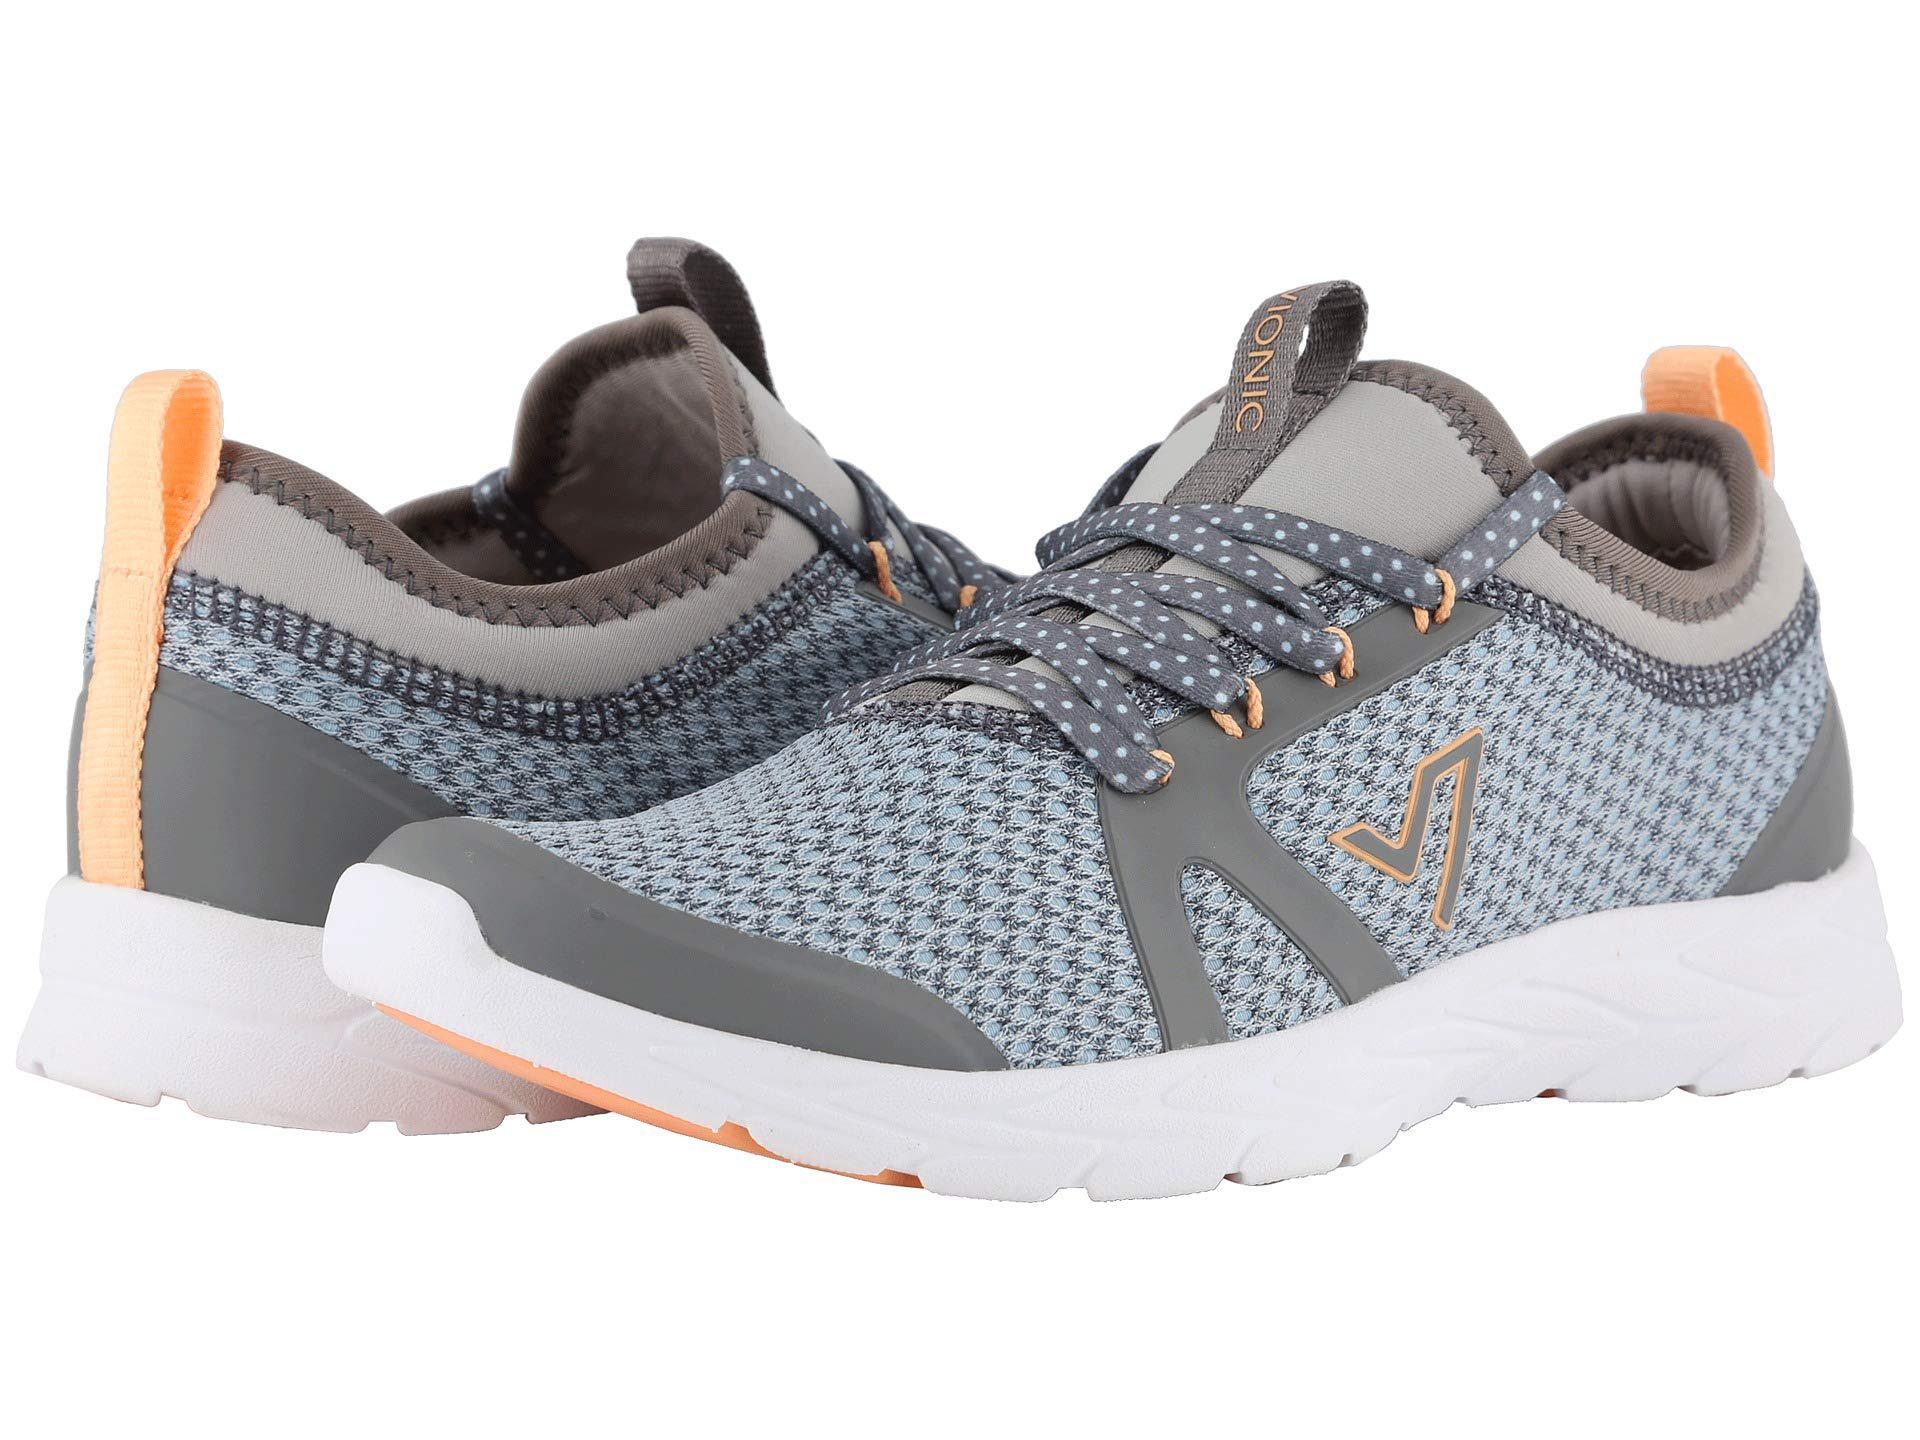 269ba86cba2 Lyst - Vionic Alma (black pink) Women s Shoes in Gray